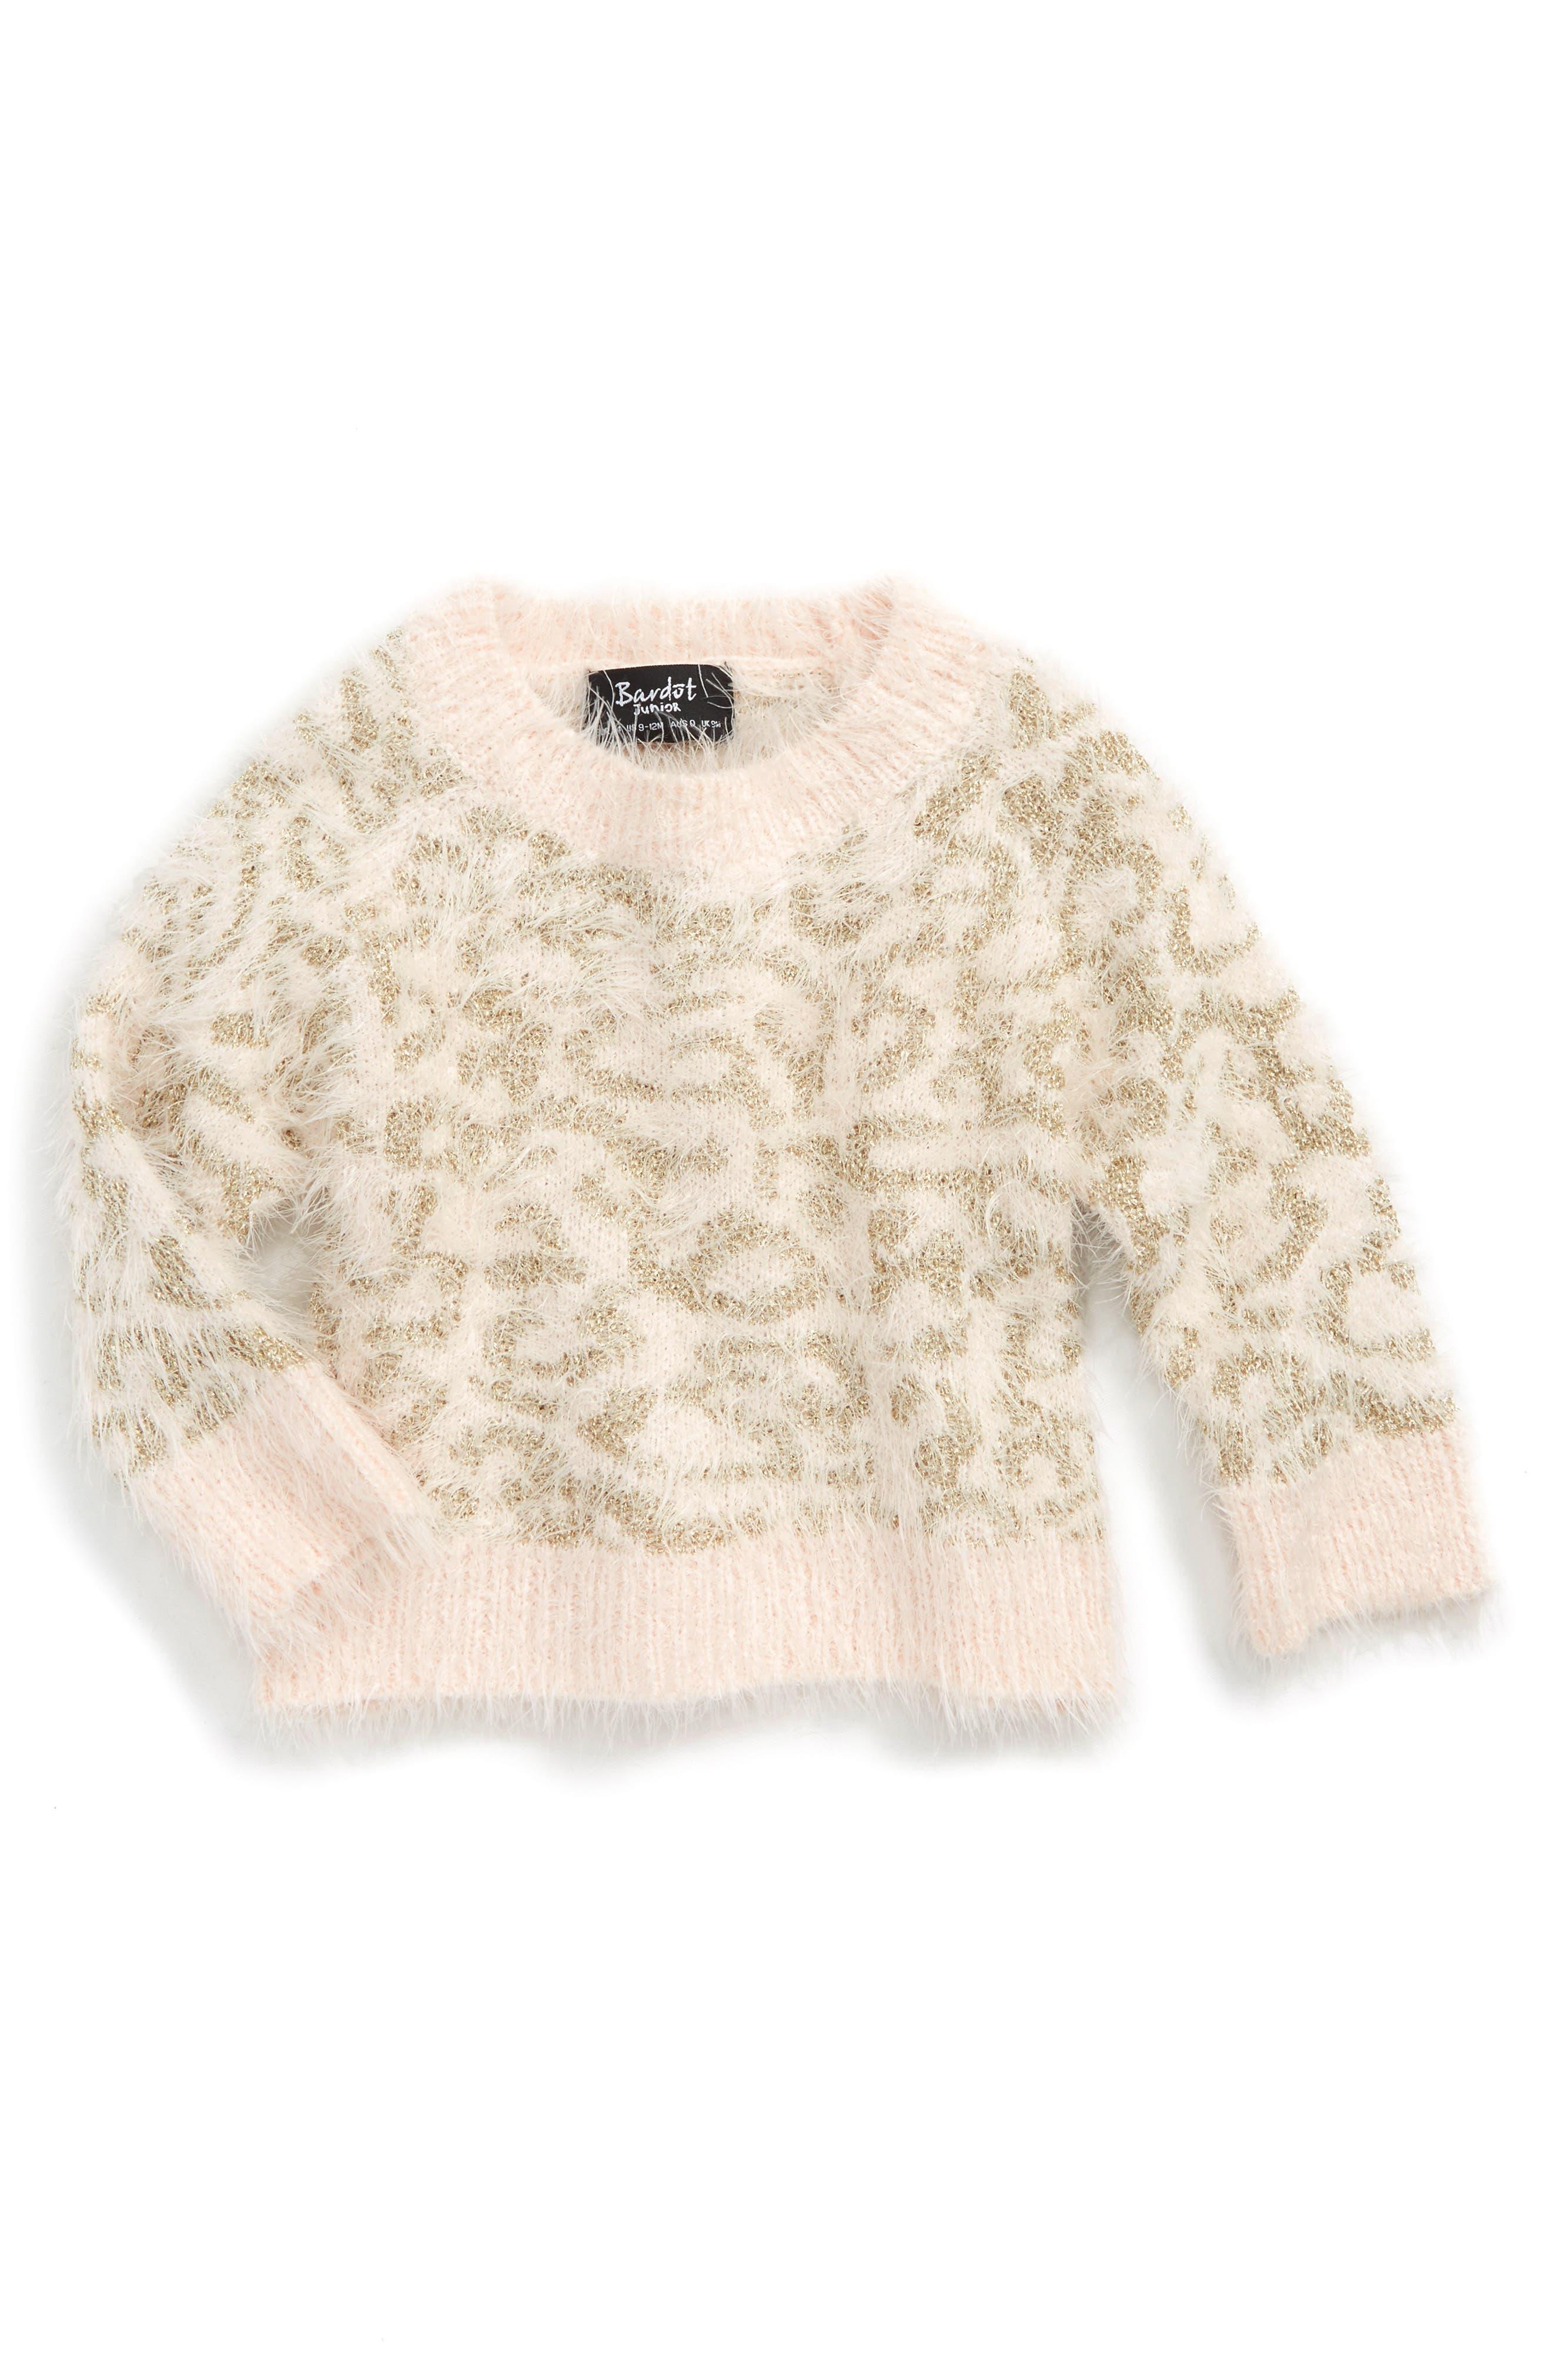 Main Image - Bardot Junior Fluffy Leopard Sweater (Baby Girls & Toddler Girls)